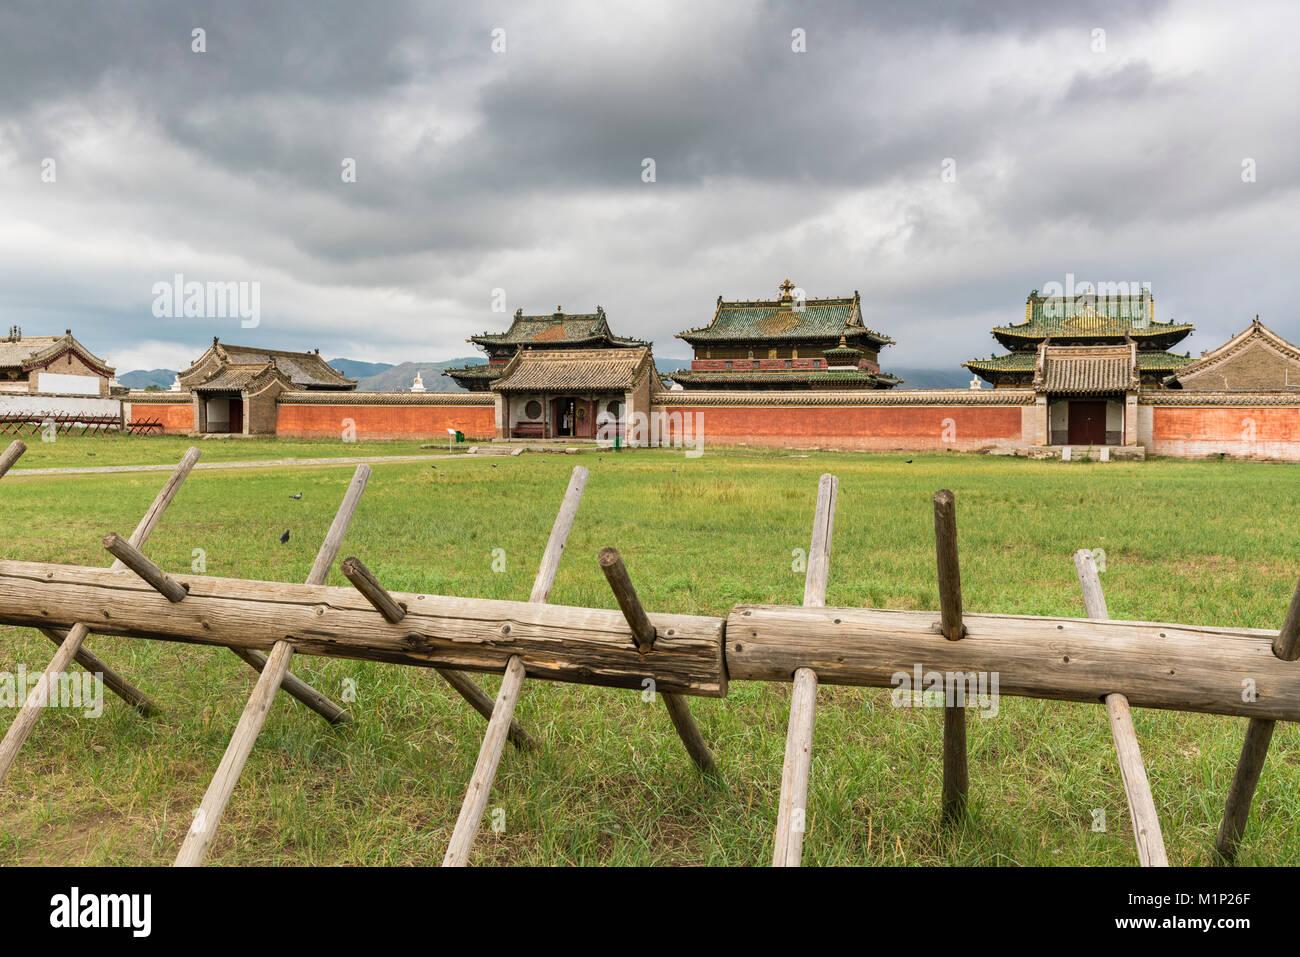 Templos de Erdene Zuu monasterio, provincia Hangay Harhorin, Sur, Mongolia, Asia Central, África Imagen De Stock